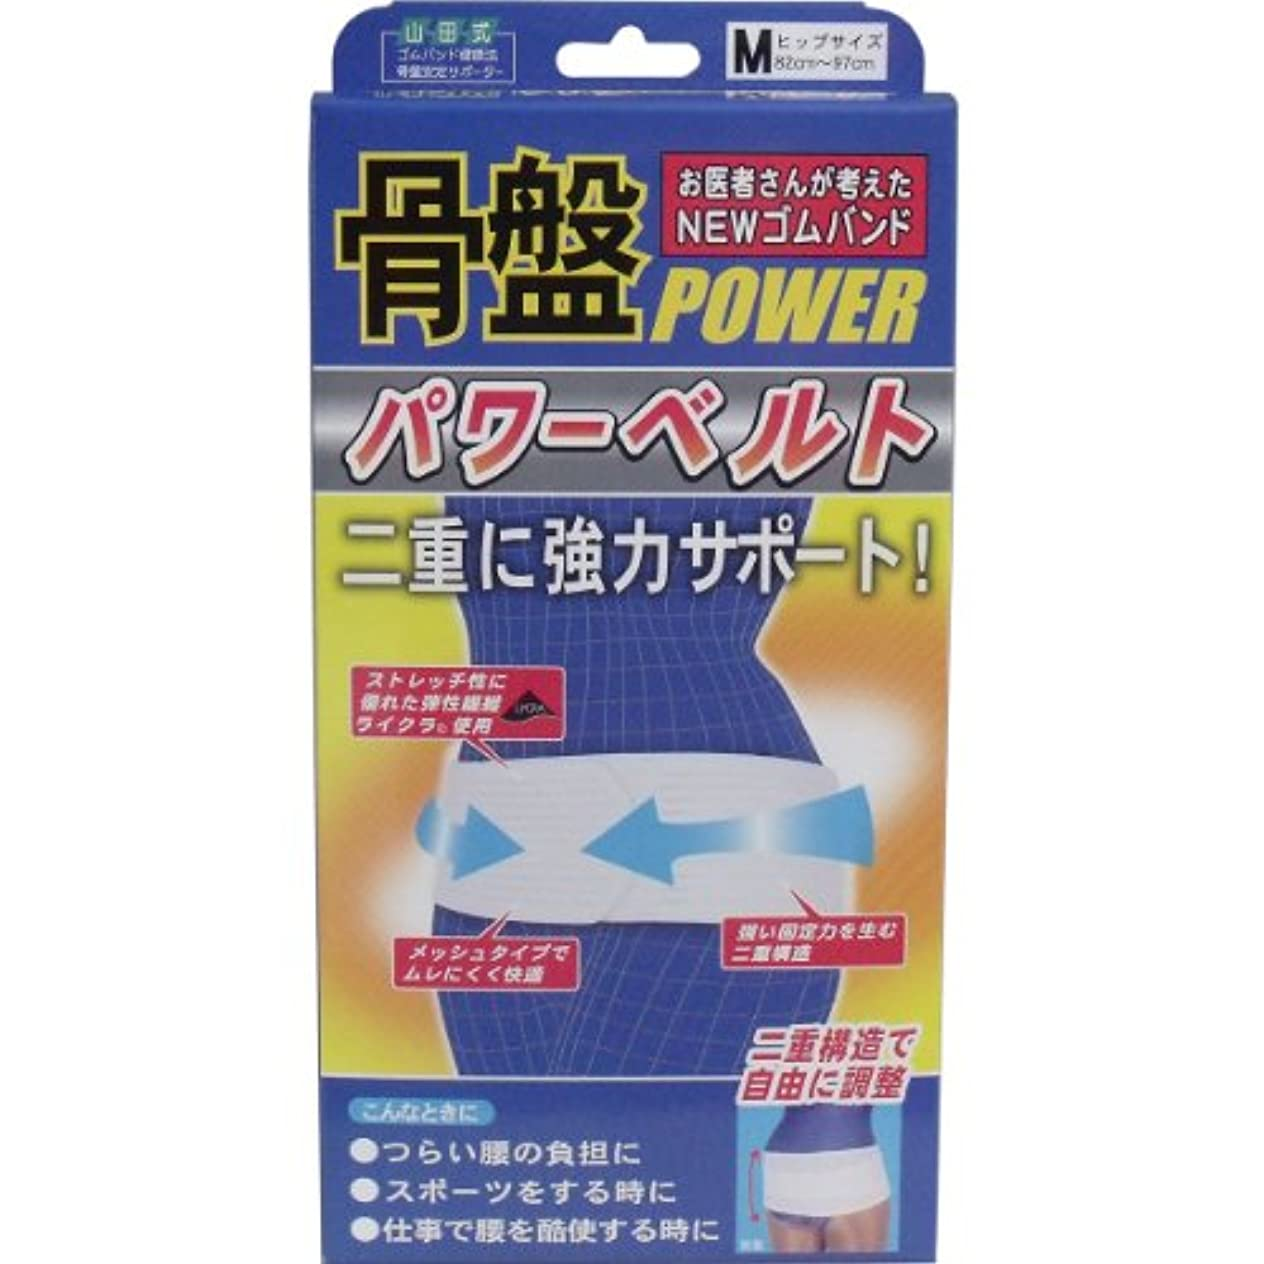 NEWゴムバンド 骨盤パワーベルト 強力二重構造 Mサイズ 【4個セット】